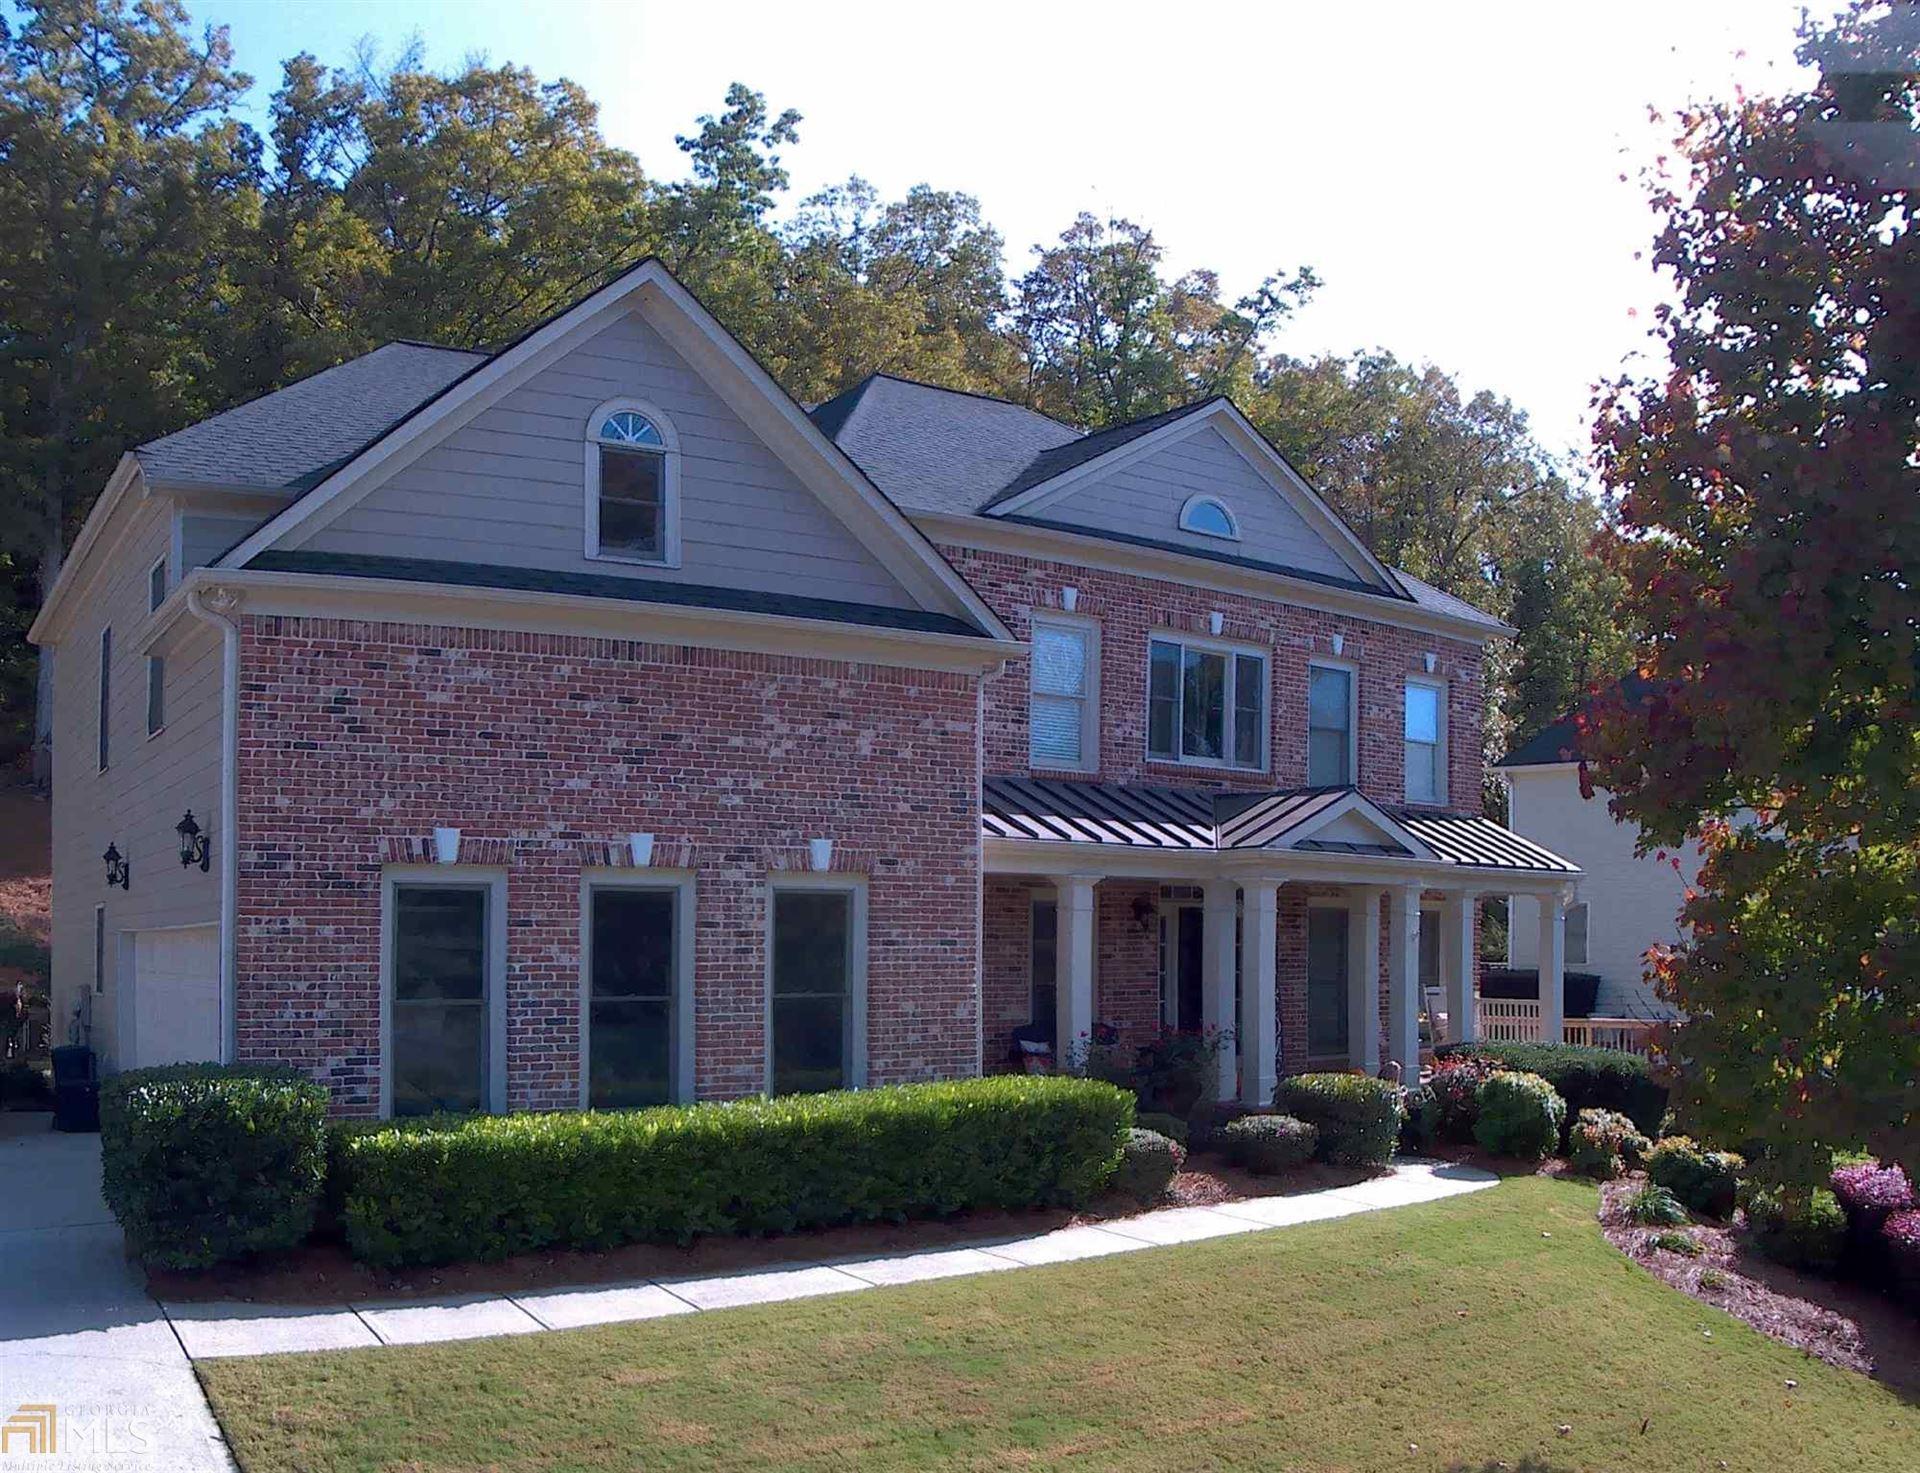 517 Streamwood Ivy Trl, Suwanee, GA 30024 - MLS#: 8885837